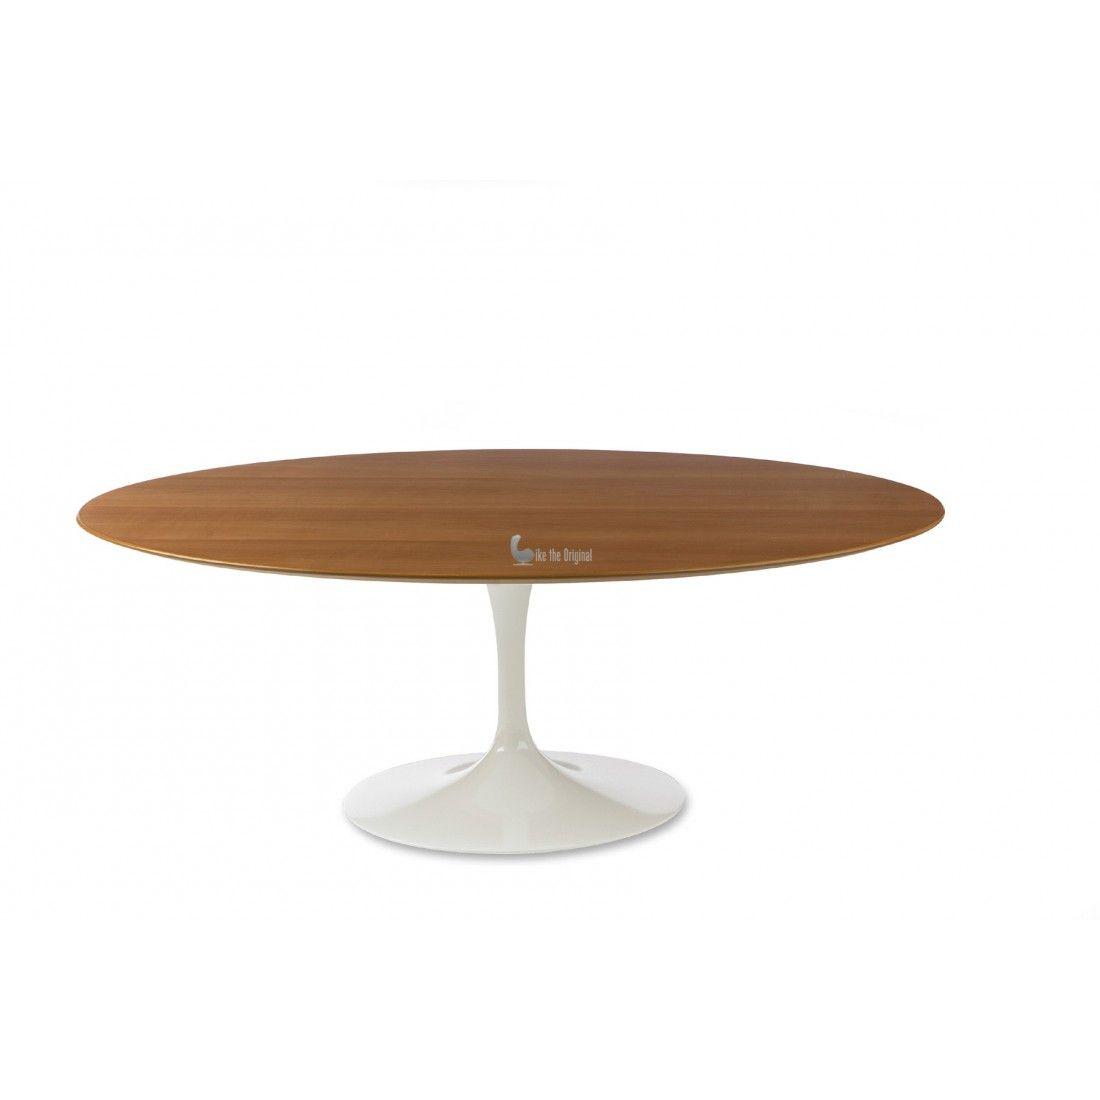 Eero Saarinen U2013 Tulip U2013 Oval Dining Table U2013 Wood. Reproduction, More  Choices Of